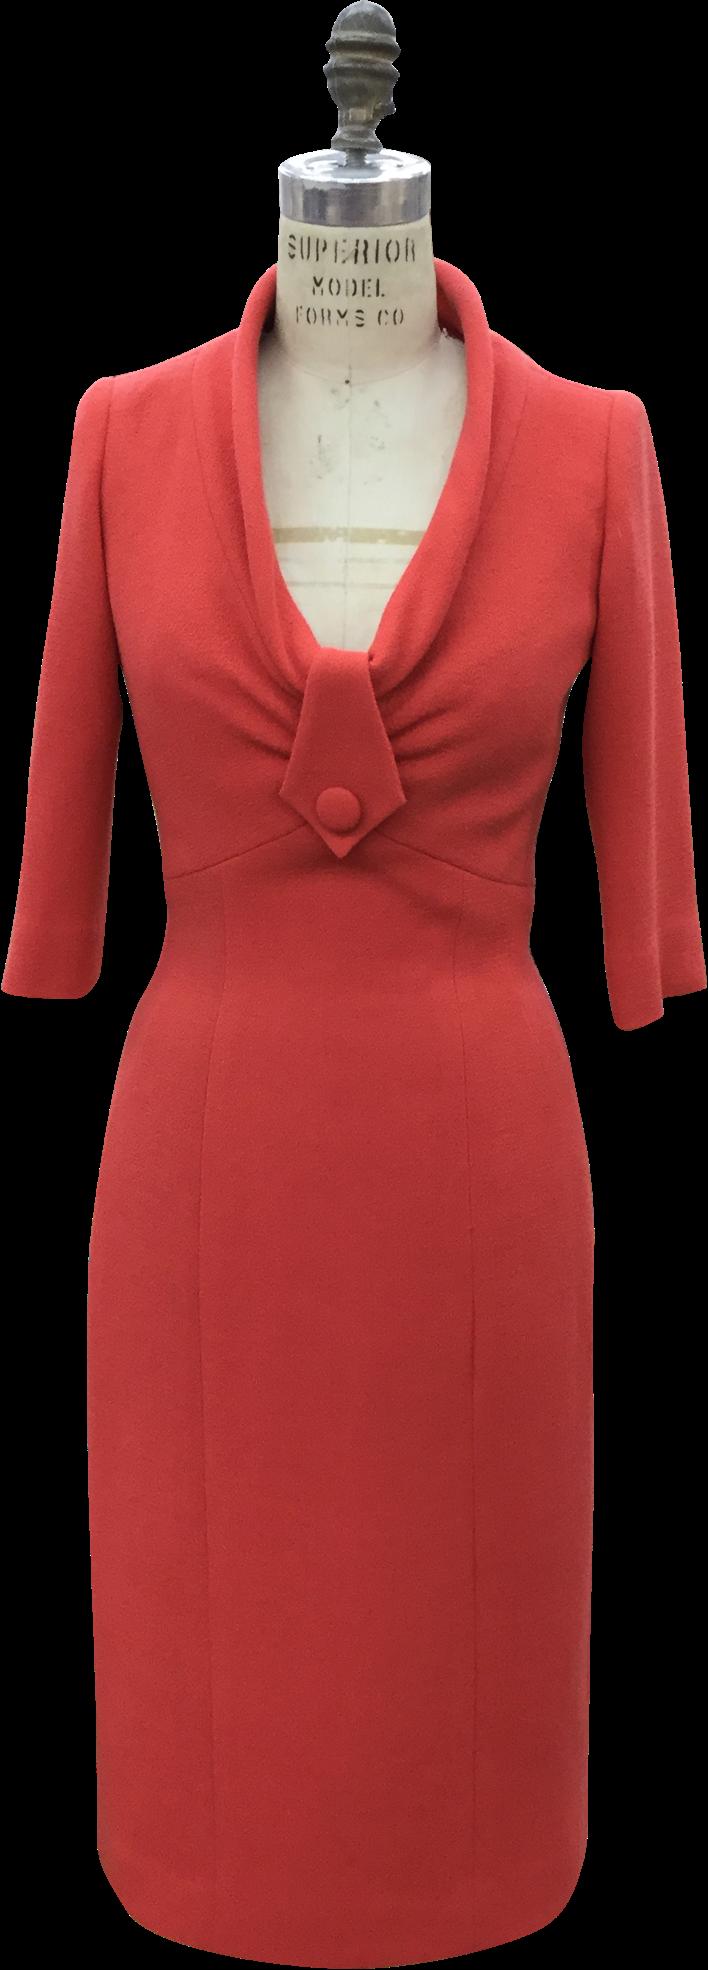 The Marvelous Mrs. Maisel red dress on mannequin